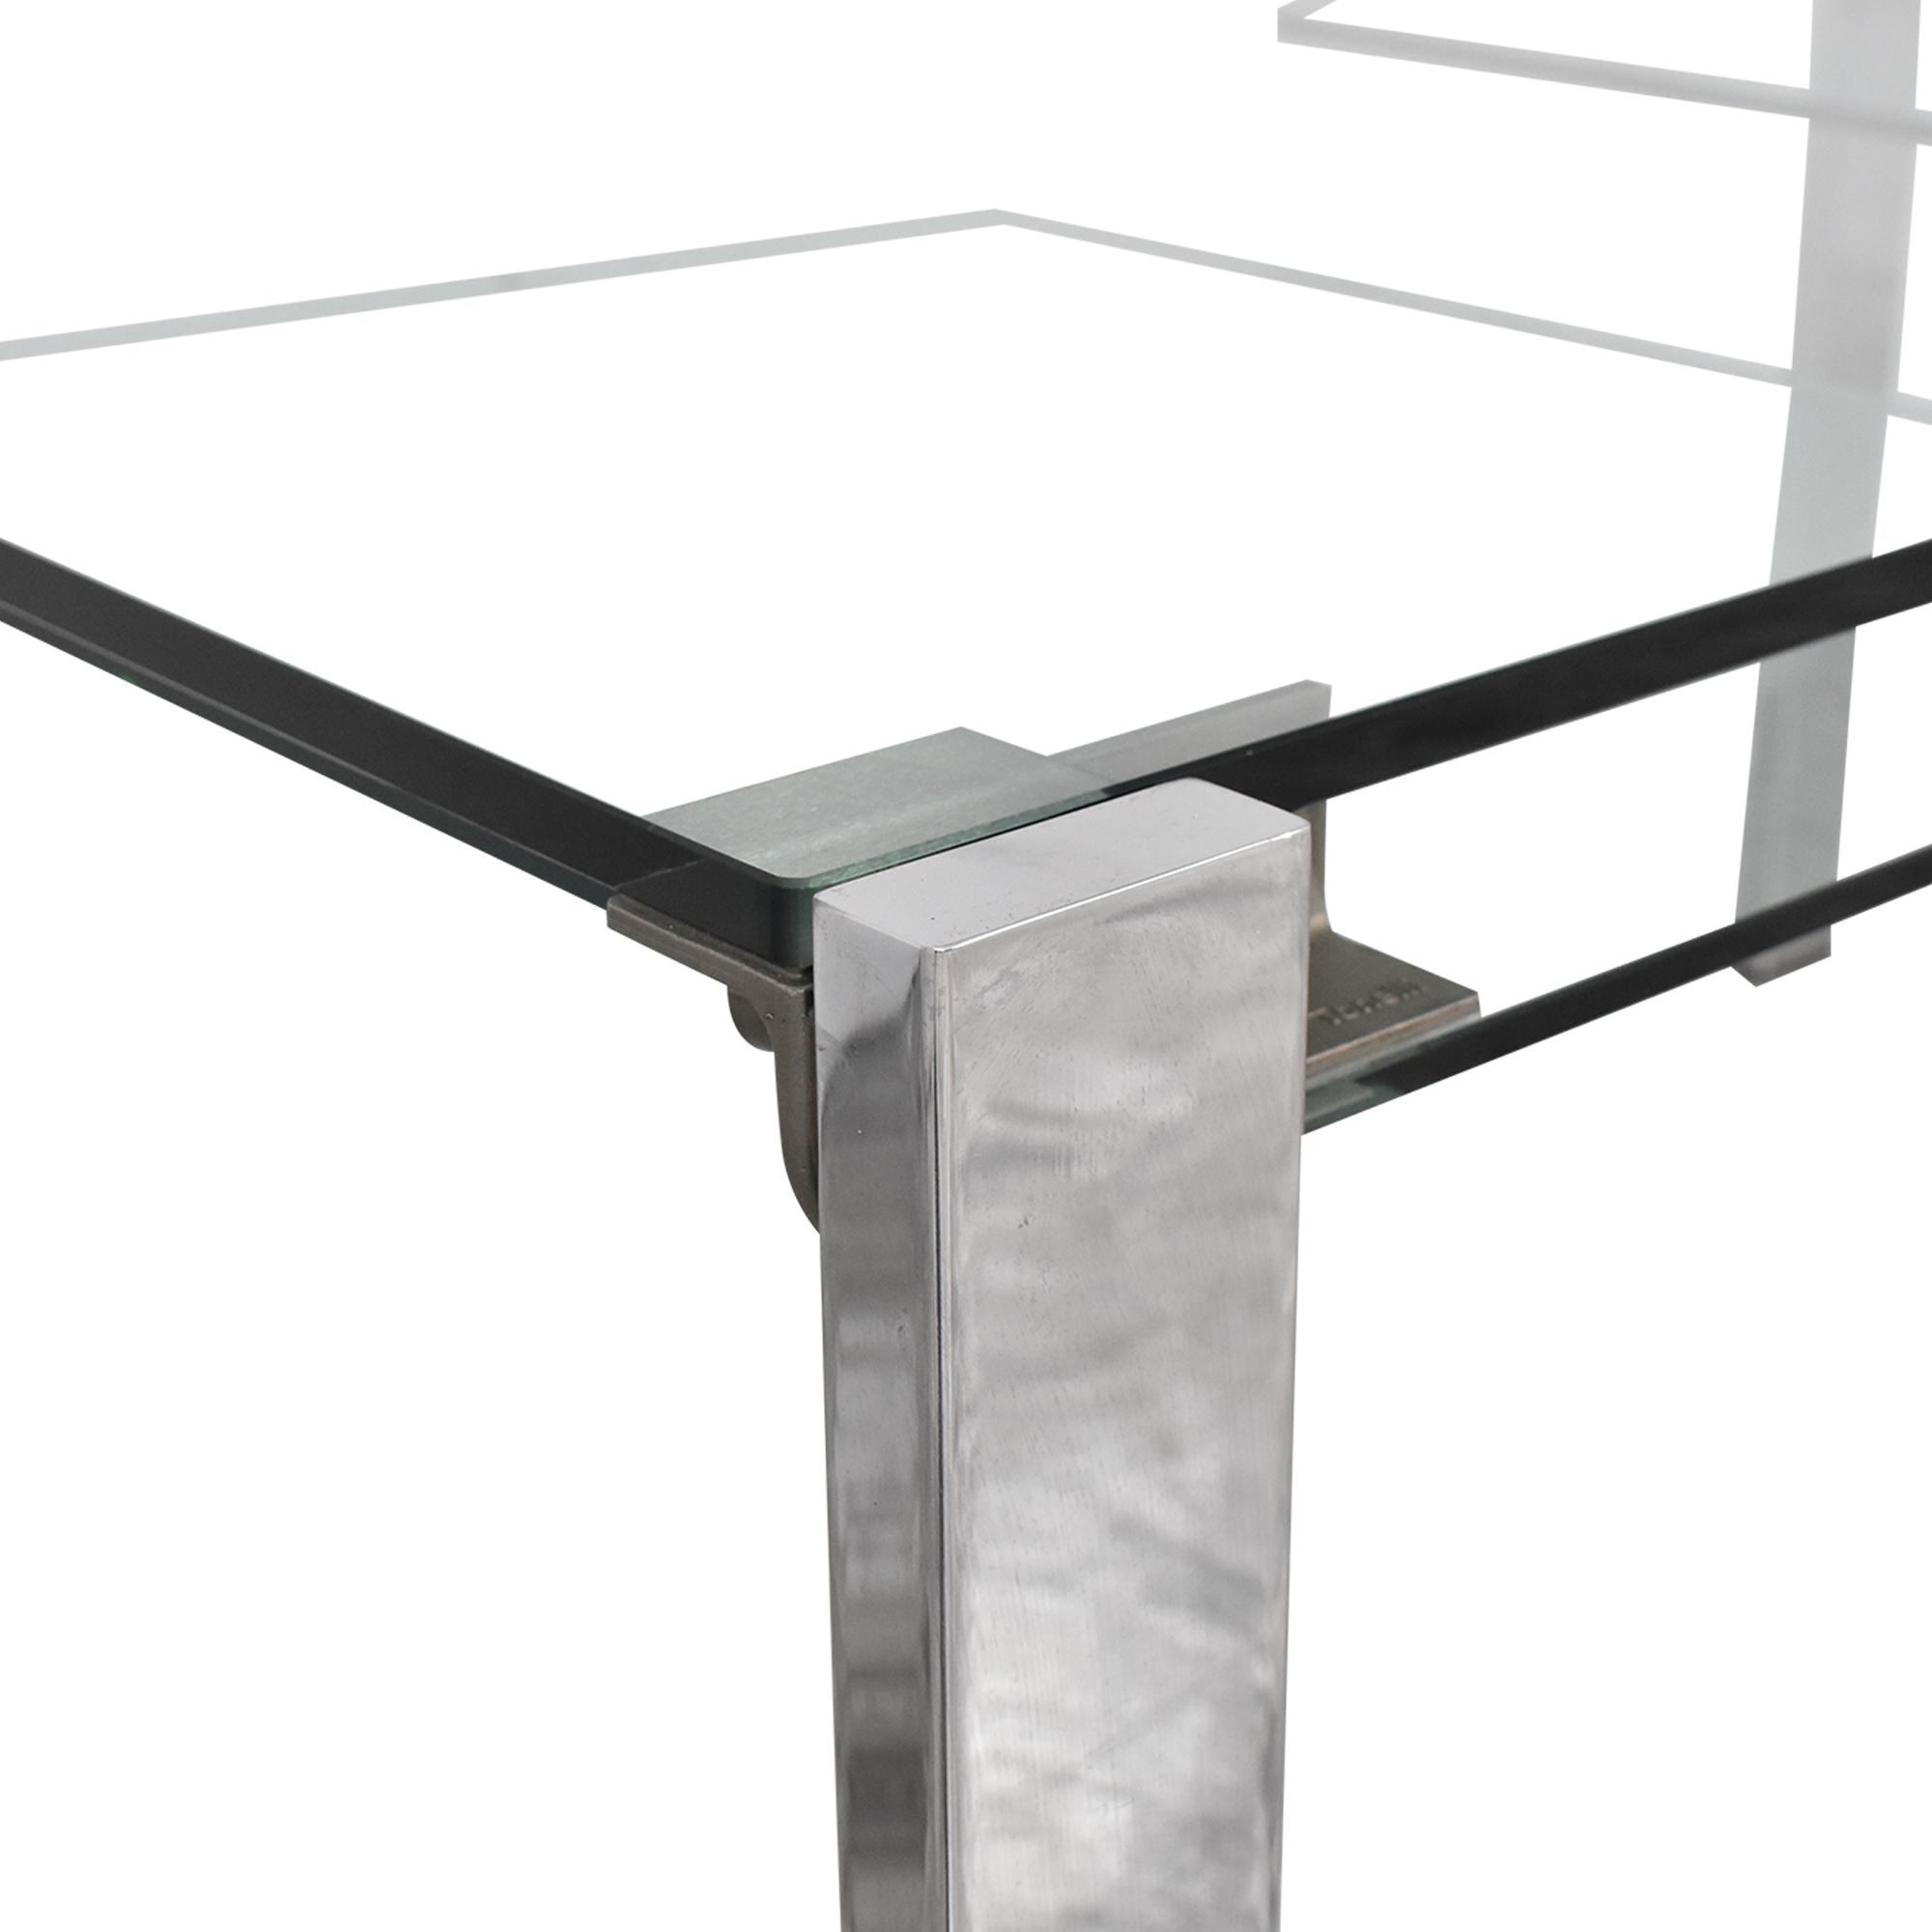 Tonelli Design Tonelli Design Livingstone Dining Table nj